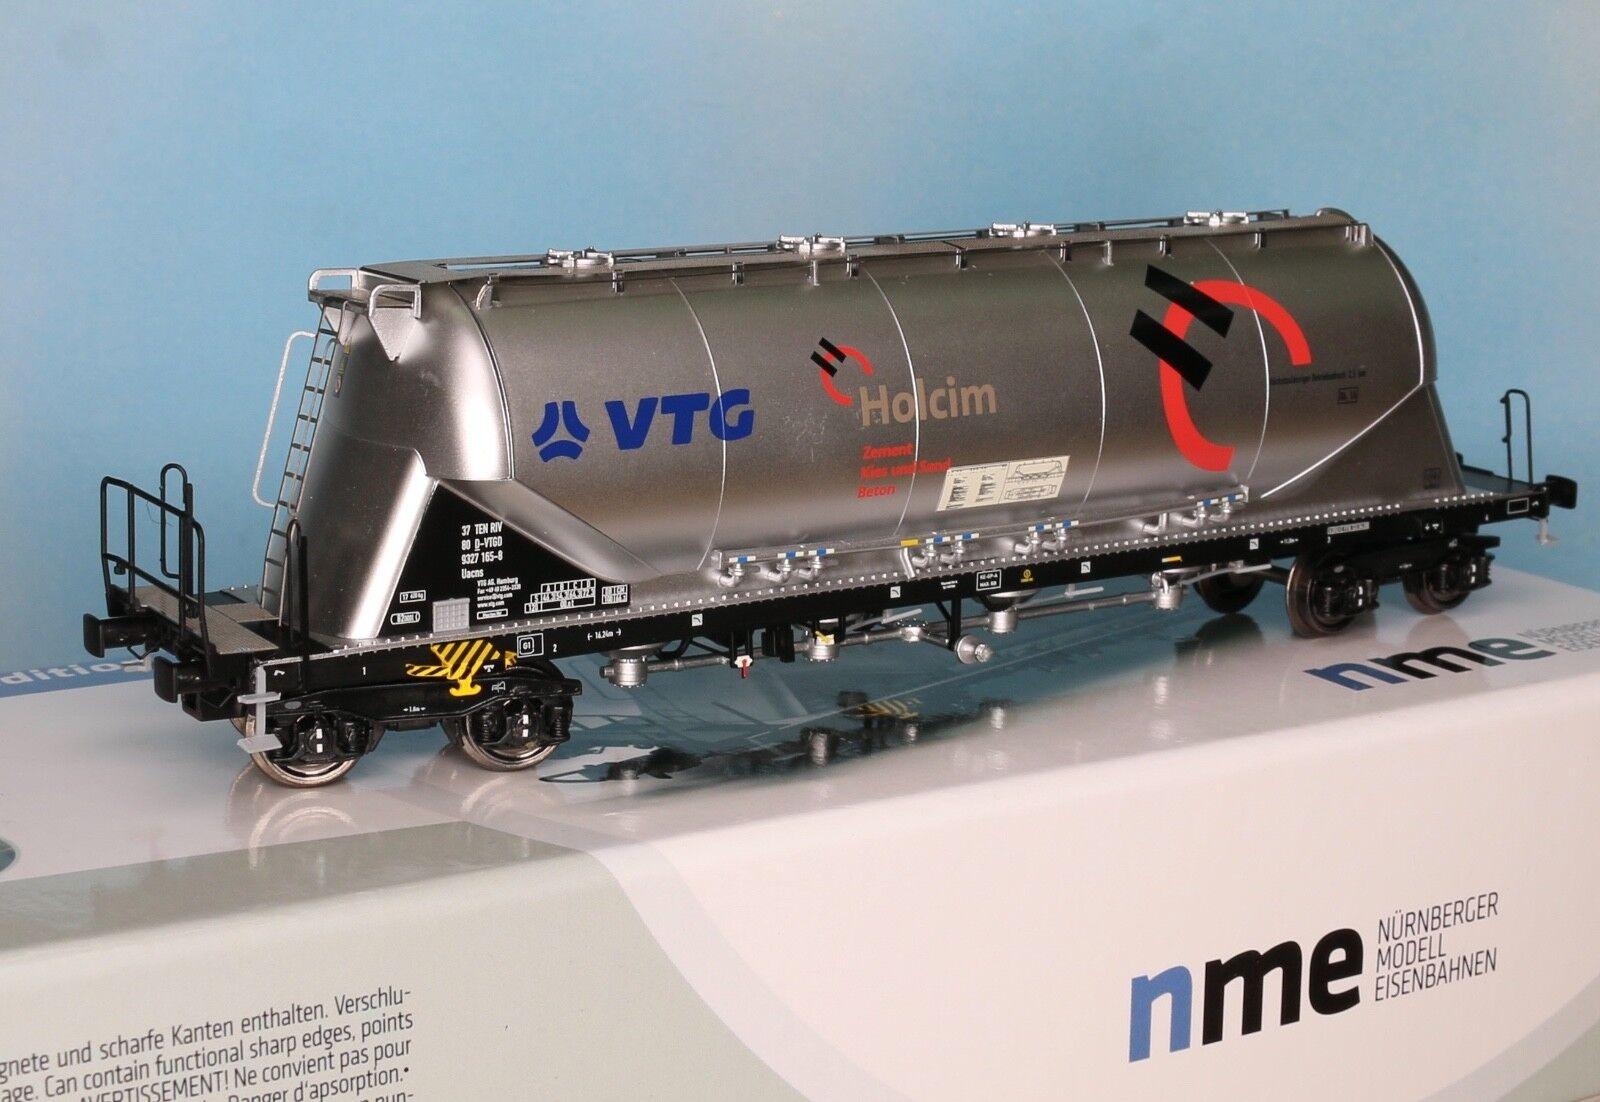 NME 503603, Spur H0, Staub-Silowagen Typ Uacns  82 m³ VTG  Holcim, Ep. 6  | Neuer Eintrag